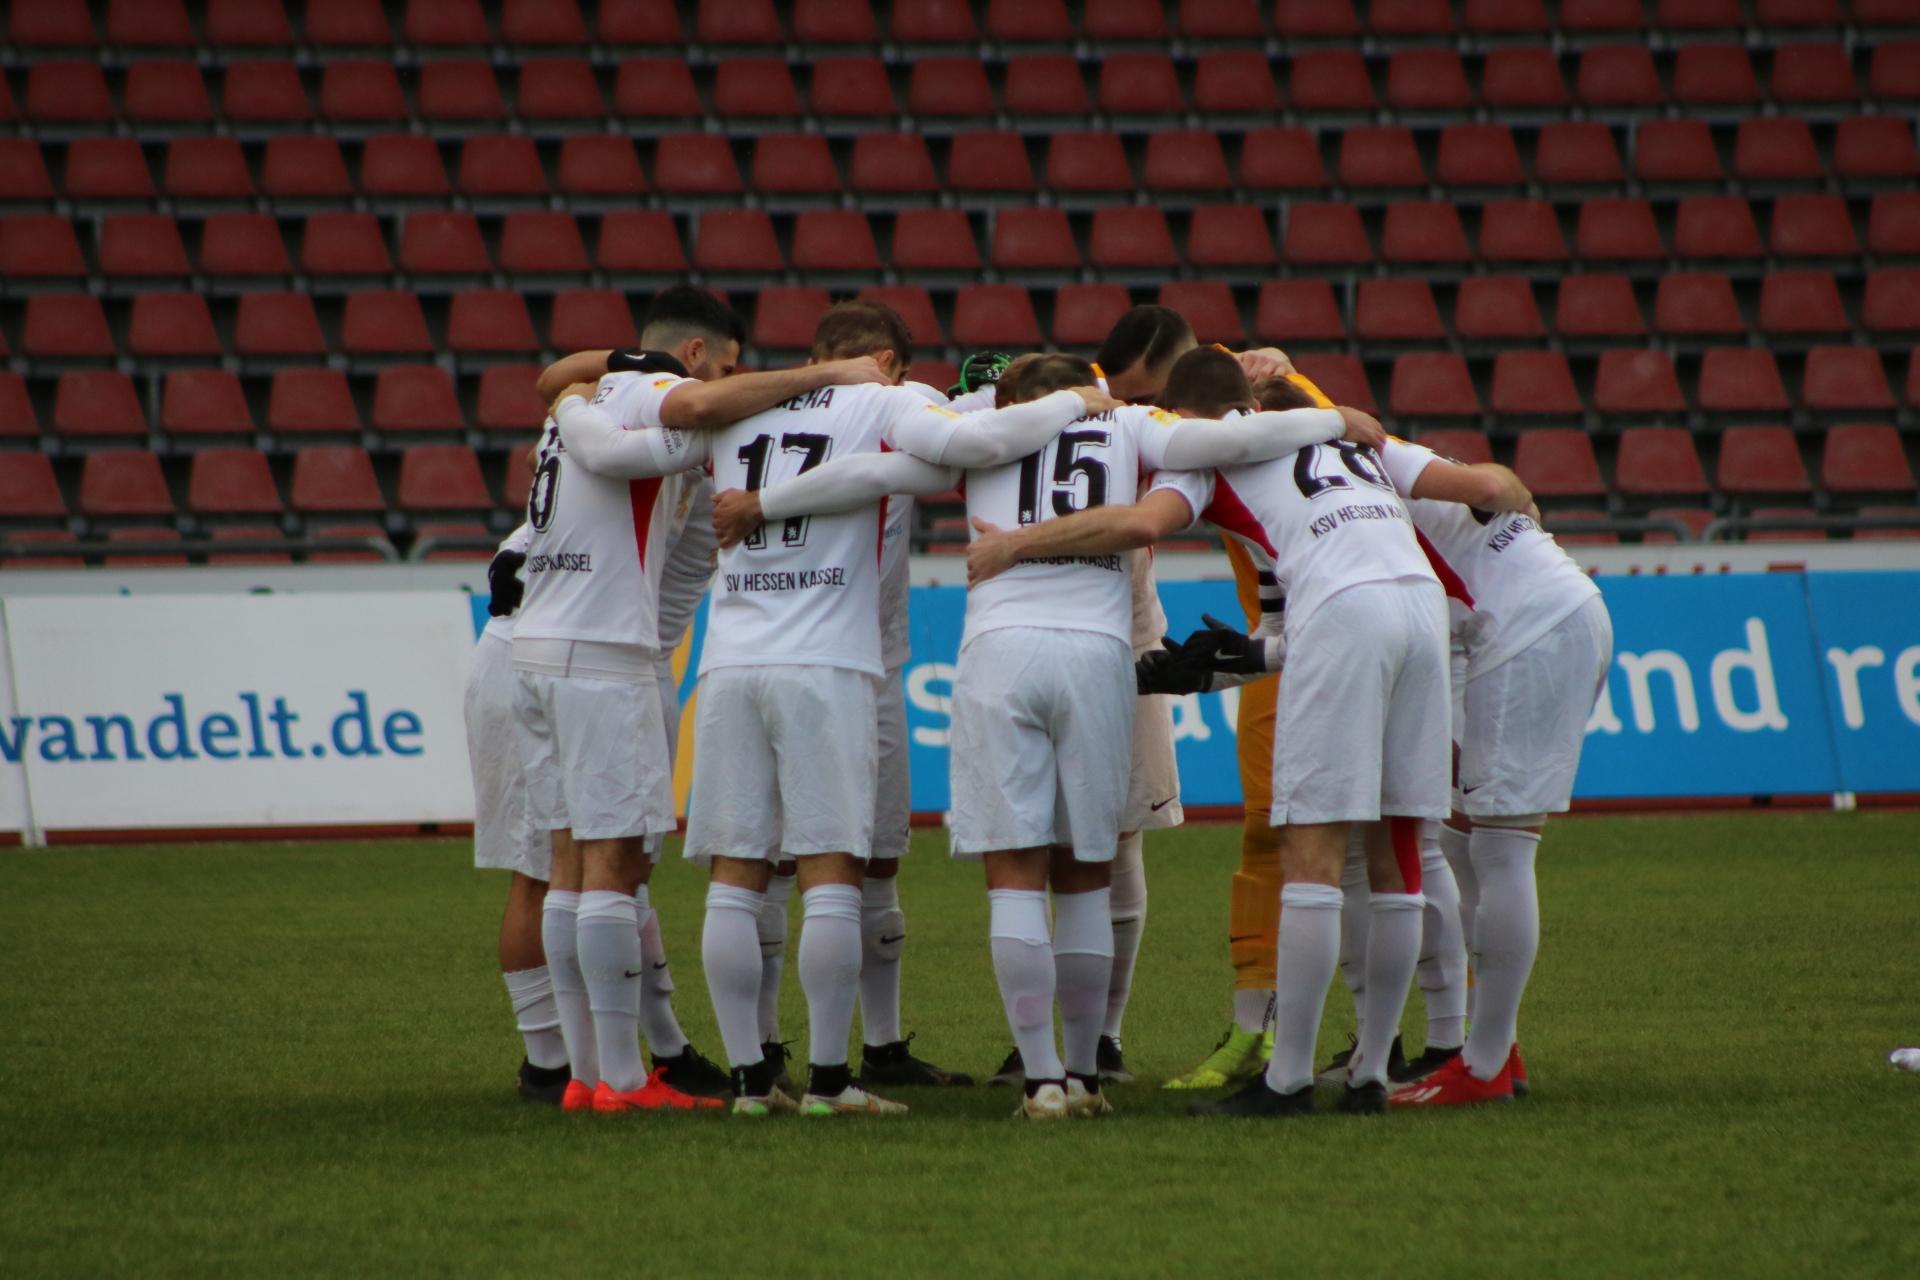 Lotto Hessenliga 2019/2020, KSV Hessen Kassel, FV Bad Vilbel, Endstand 6:1, Mannschaftskreis (KSV Hessen Kassel)